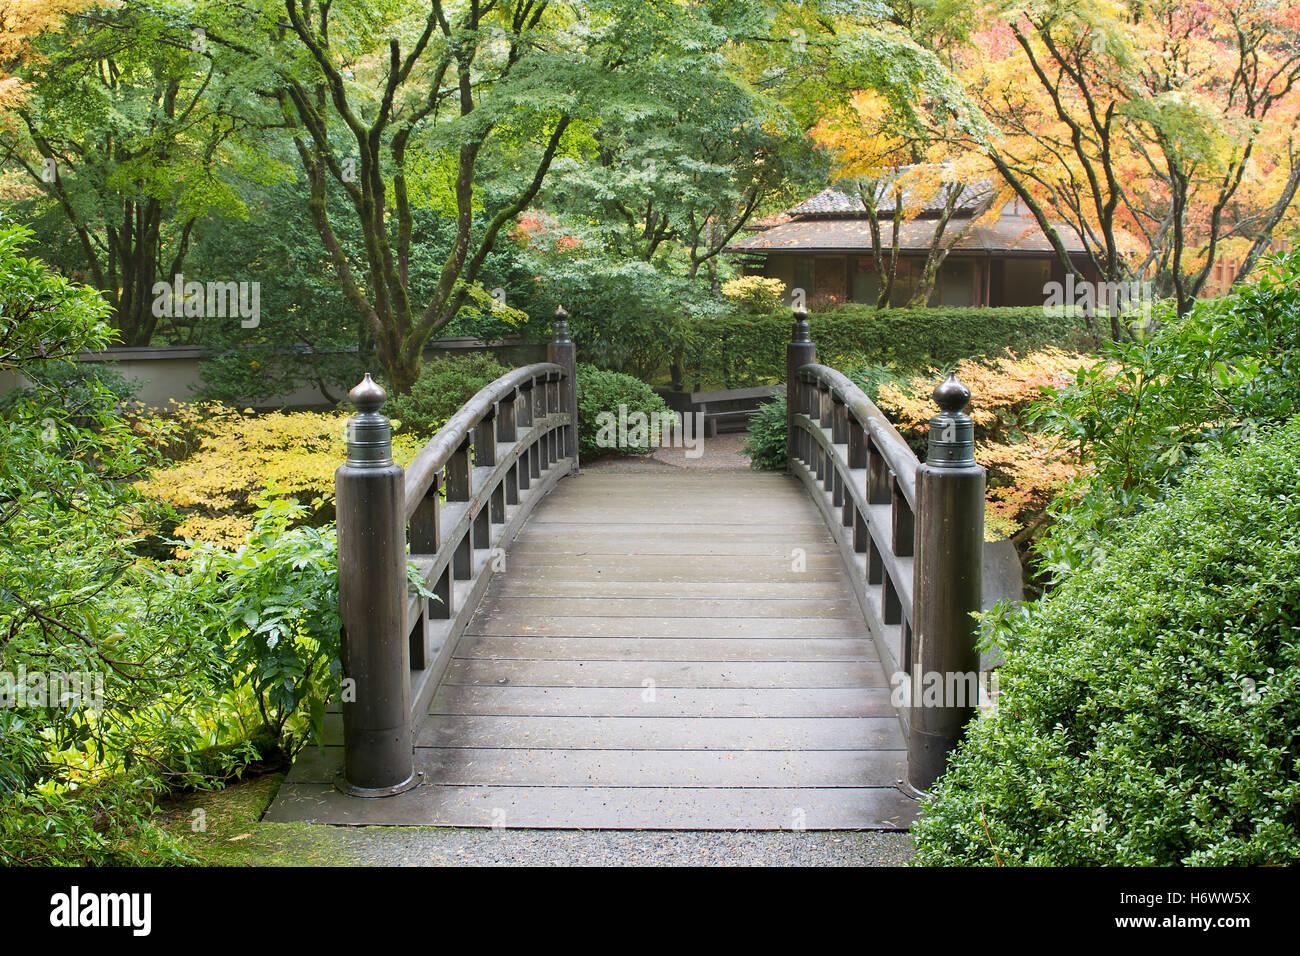 Escalier Jardin Japonais | Stone Stairway Steps In Japanese Garden ...